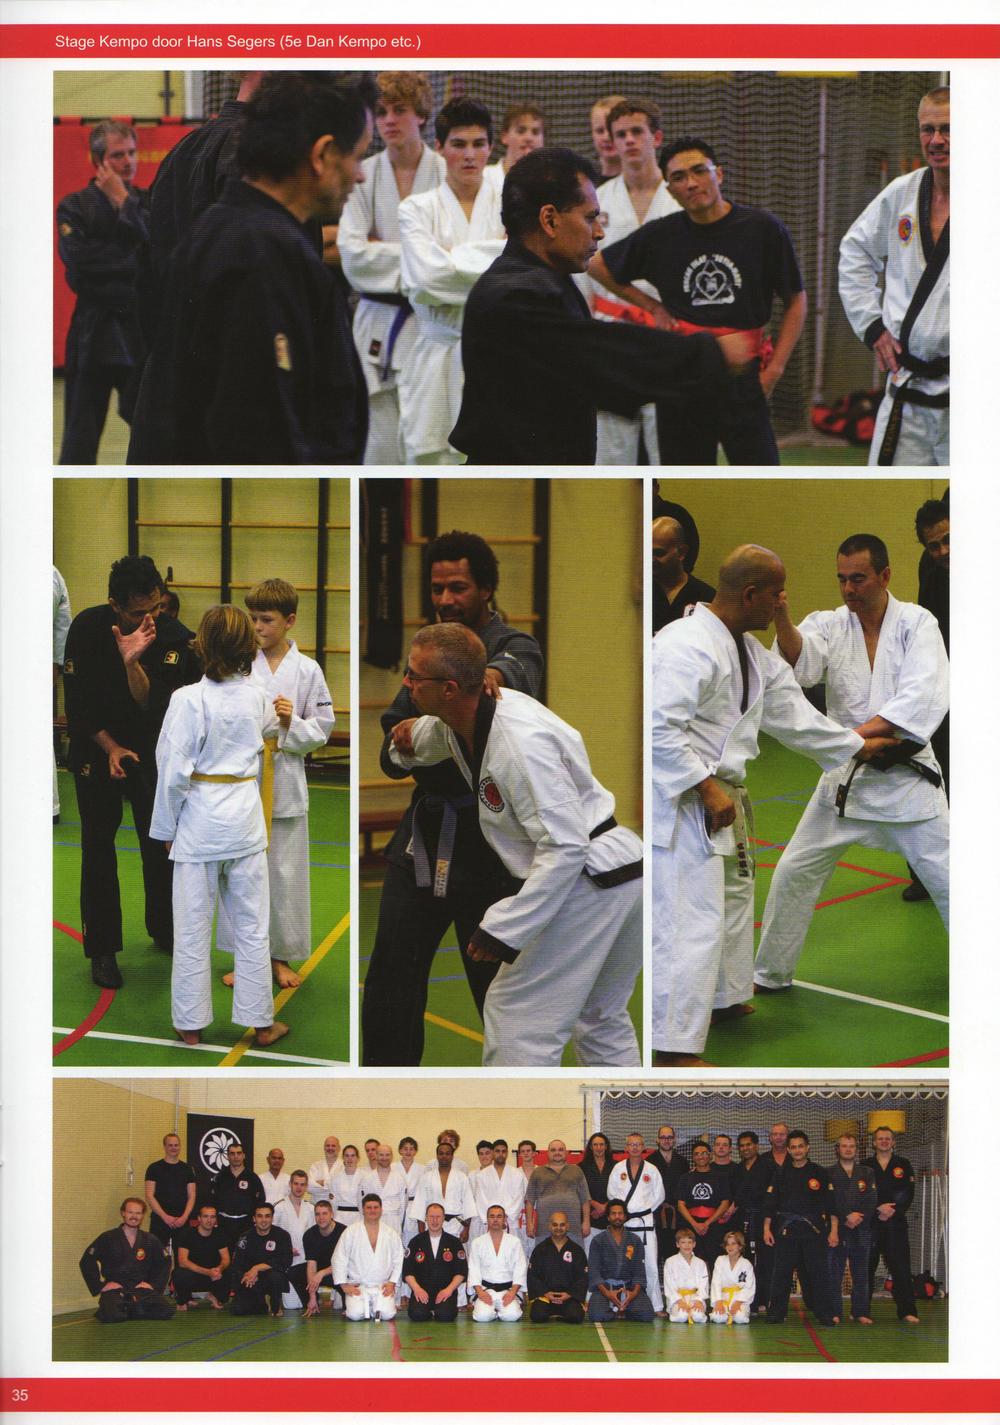 2012-11-04 NFK 7 Masters Martial Arts Festival Fotomagazine 2012 Pagina 35.jpg